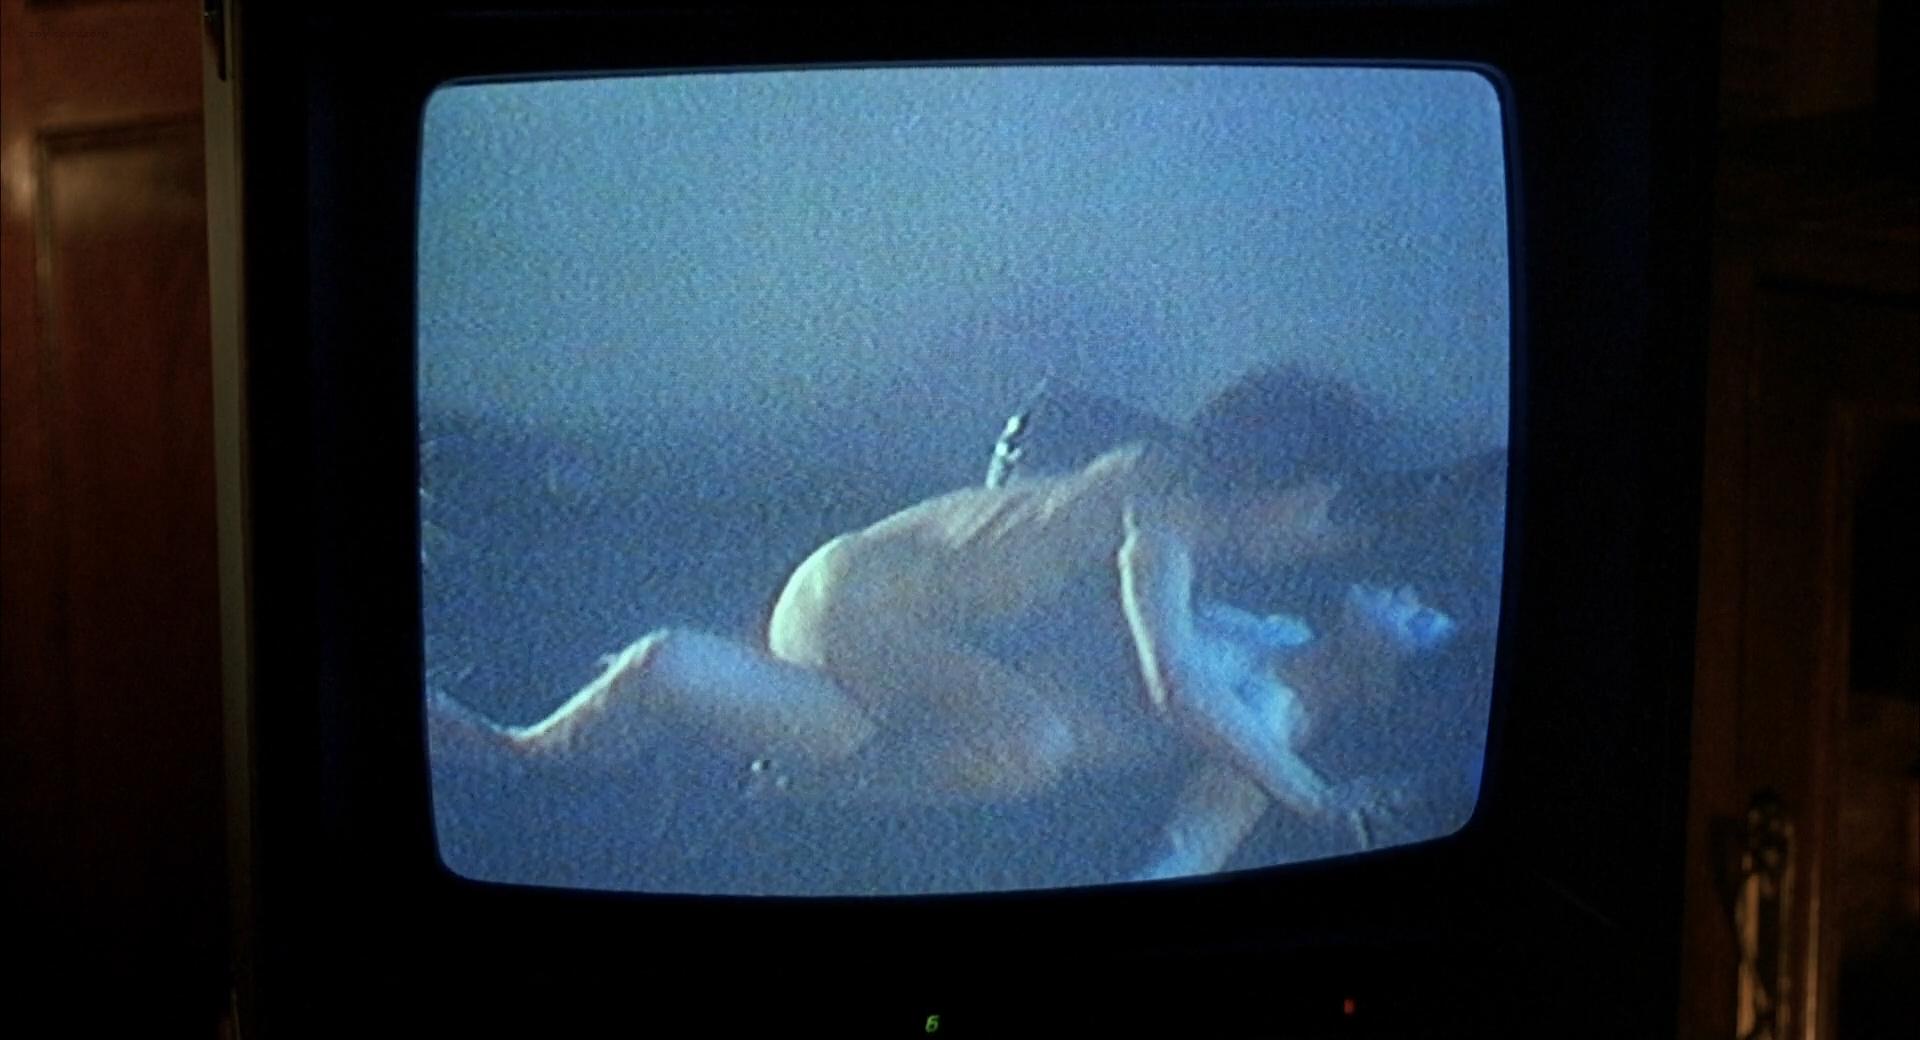 Lisa Zane nude sex Adrienne Leigh and Charisse Glenn nude sex threesome - Bad Influence (1990) HD 1080p (4)